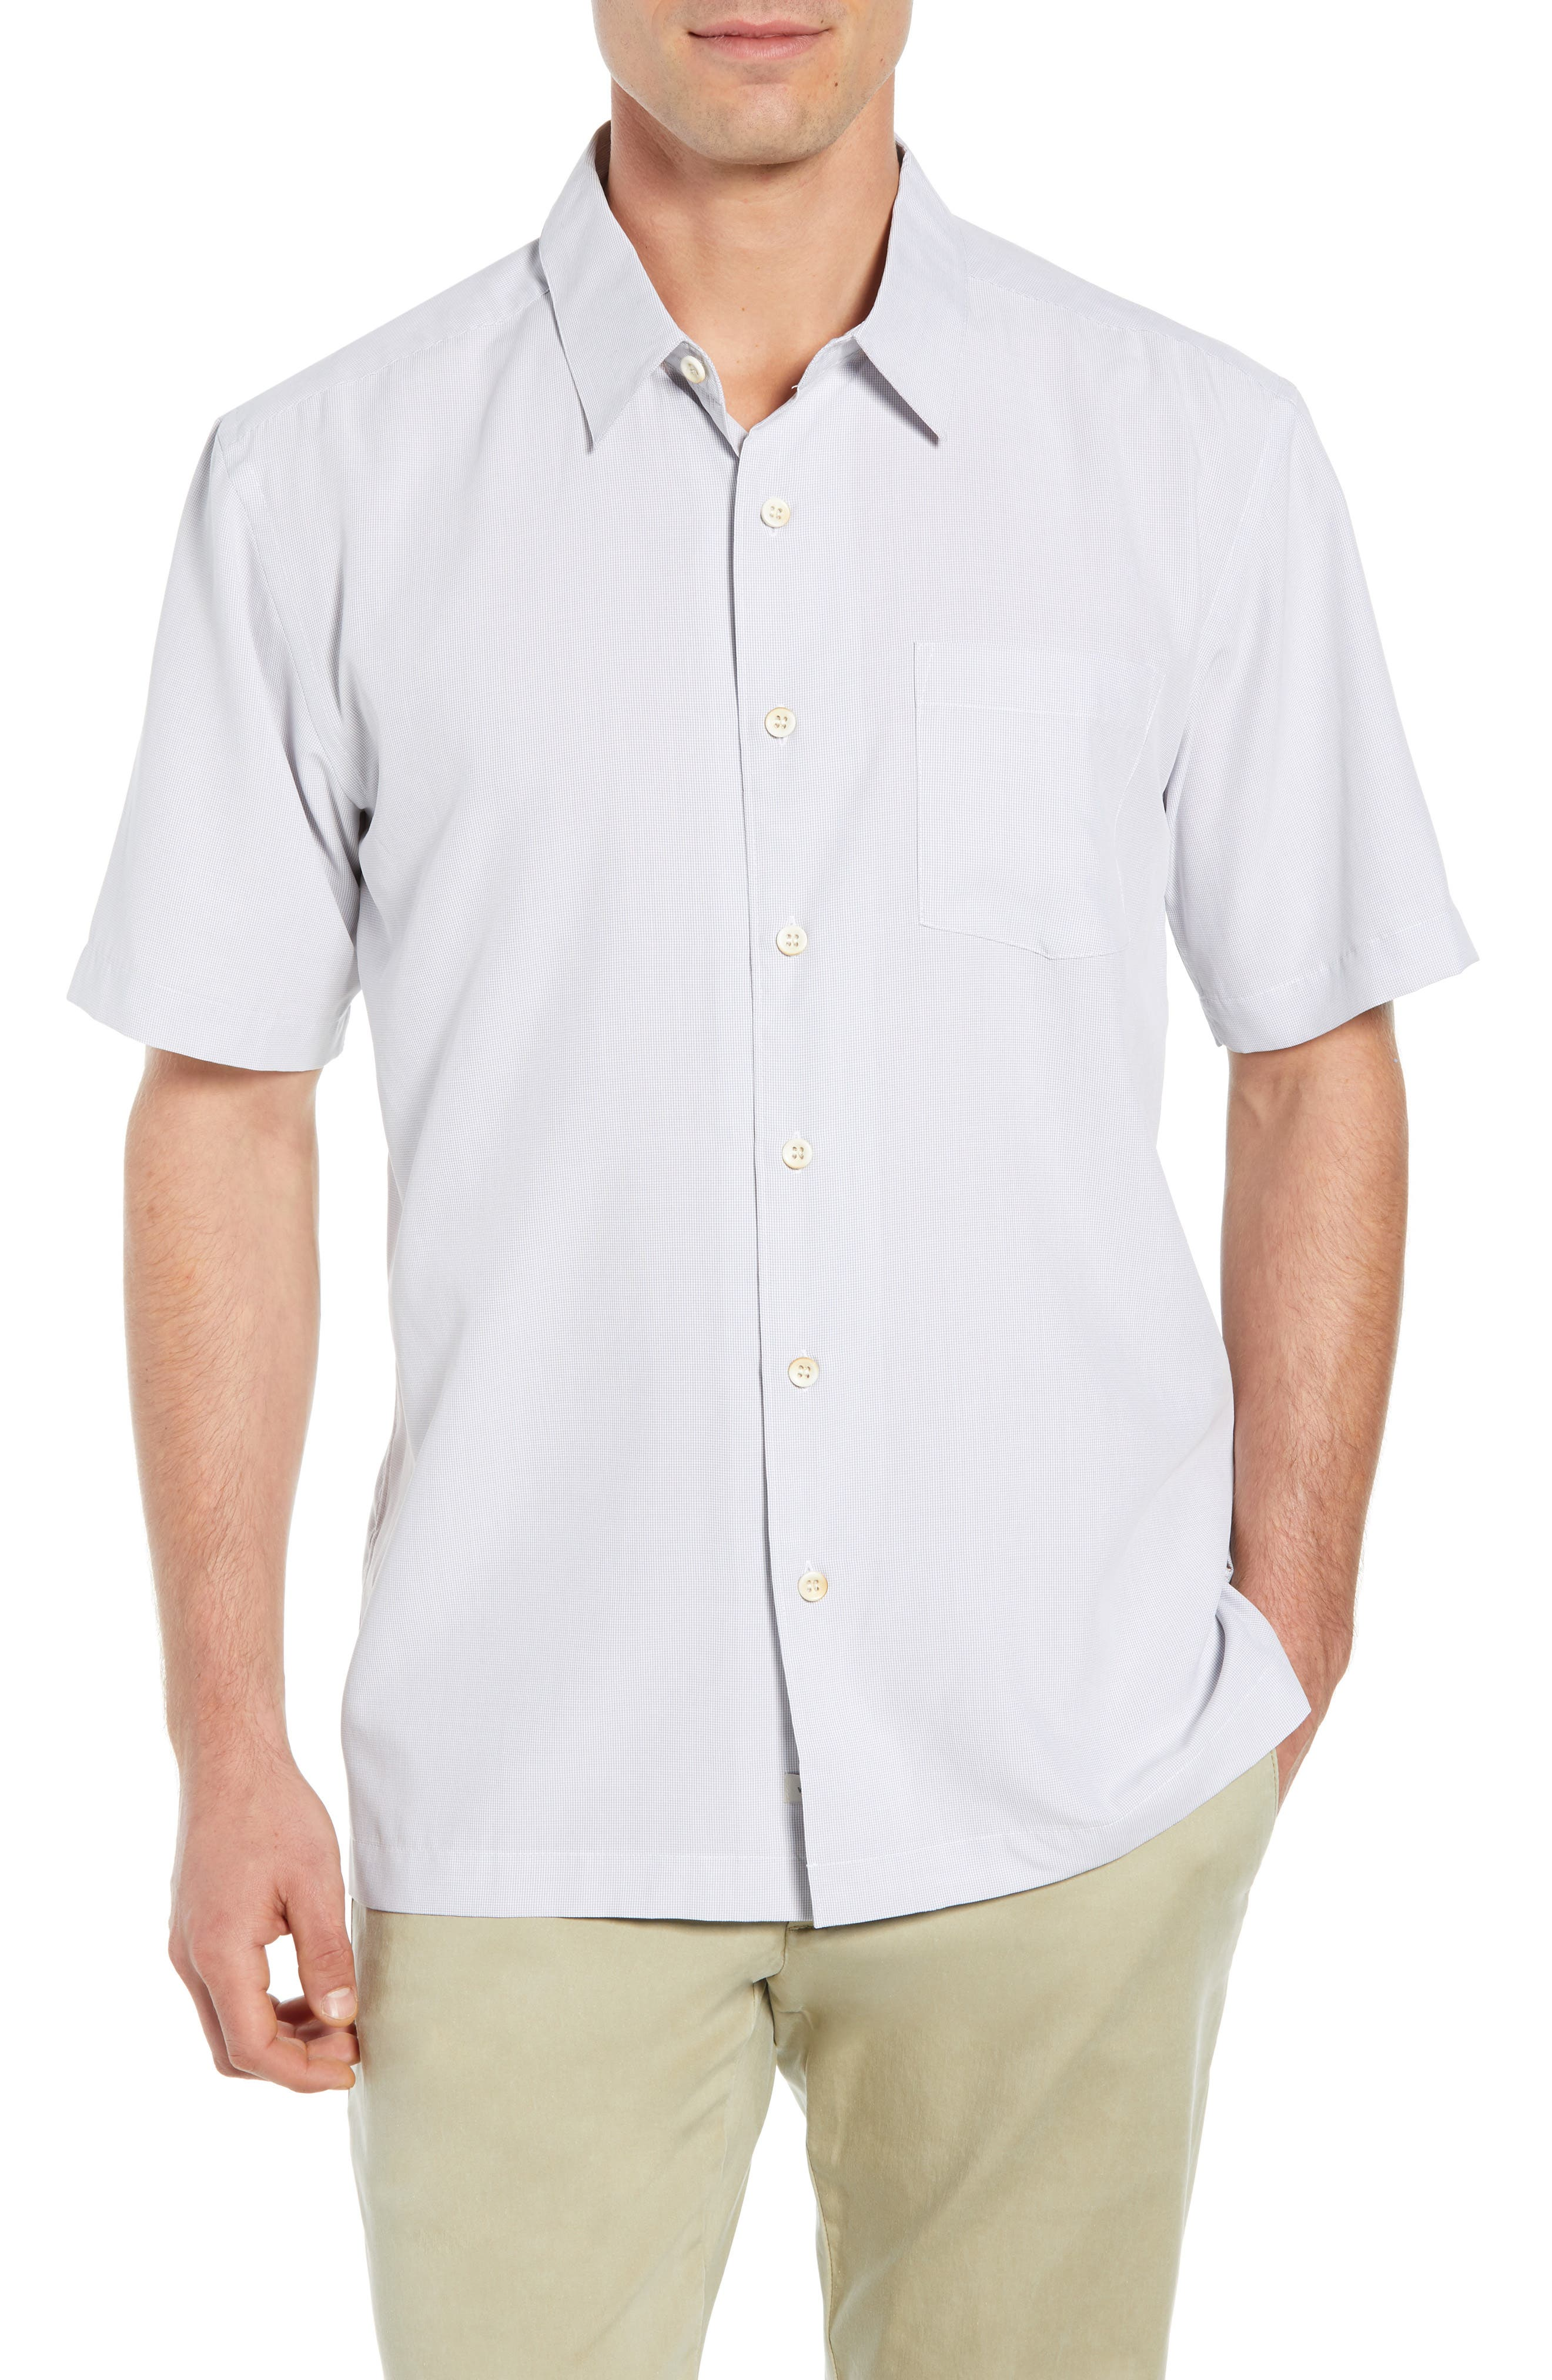 Cane Island Classic Fit Camp Shirt,                             Main thumbnail 1, color,                             101